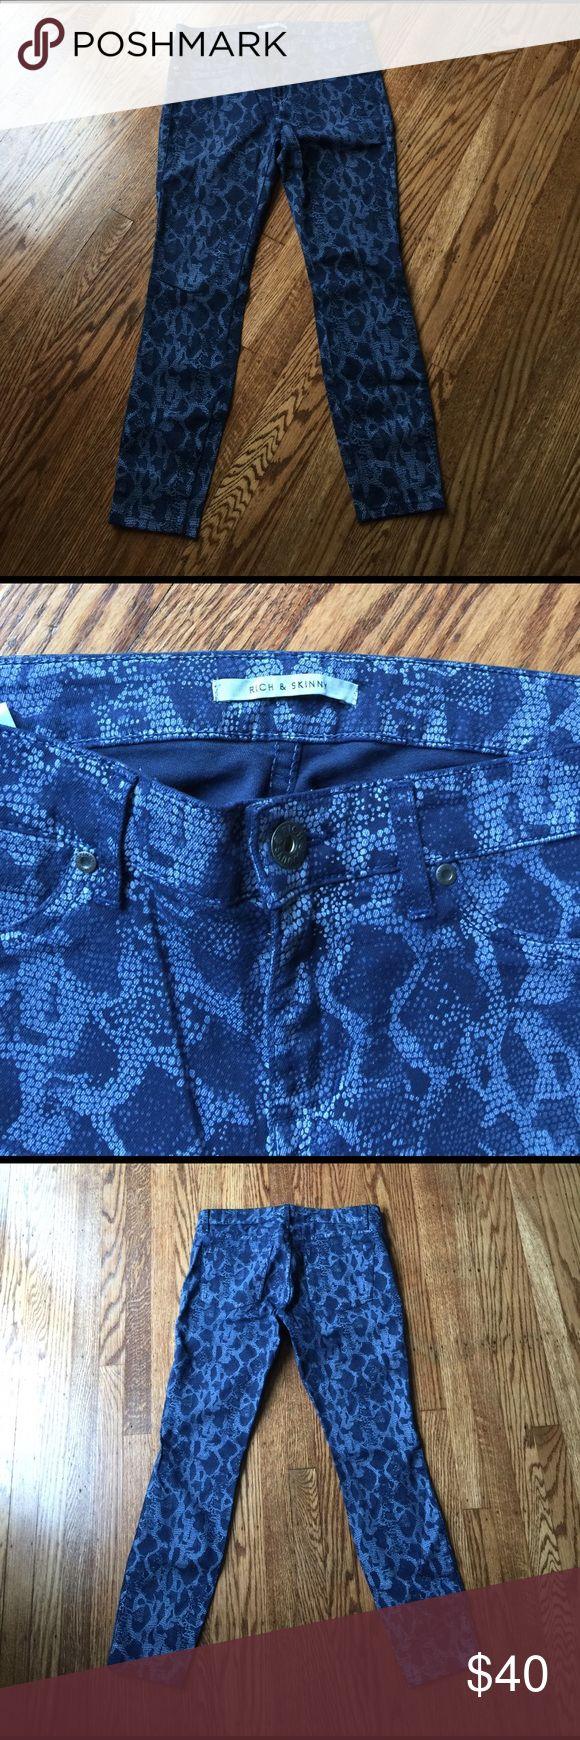 Rich & Skinny Python Print Jeans Stretch denim. 26 1/2 inseam. Size 29 Rich & Skinny Jeans Skinny